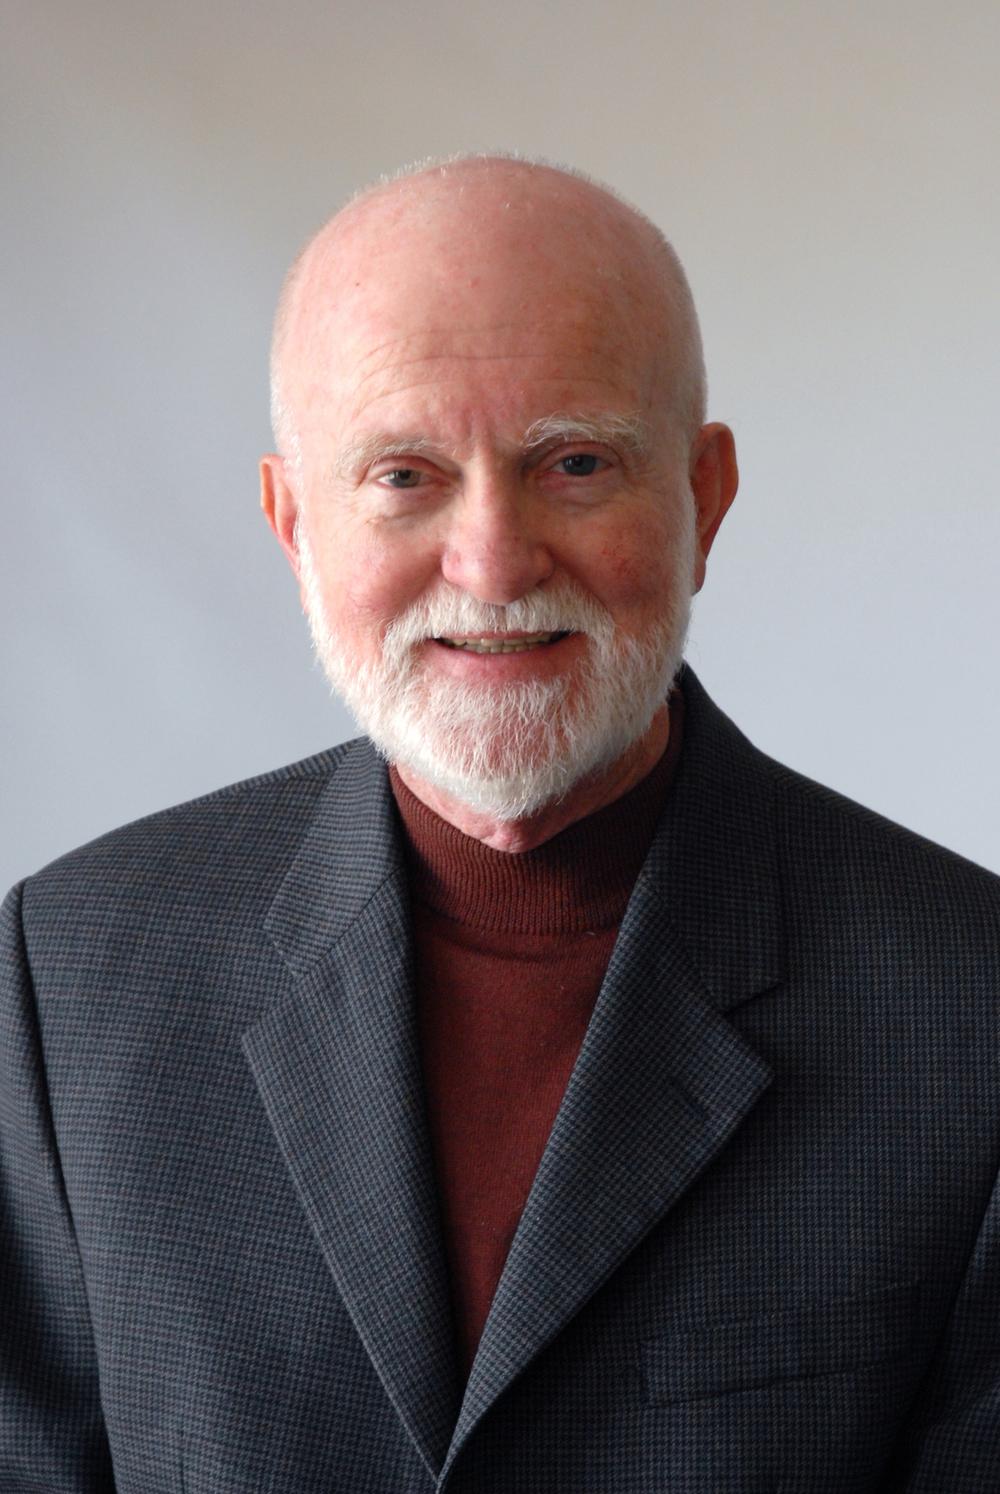 Joseph F. Byrnes;Professor Emeritus;Modern European History;Oklahoma State University. Joseph.Byrnes@okstate.edu